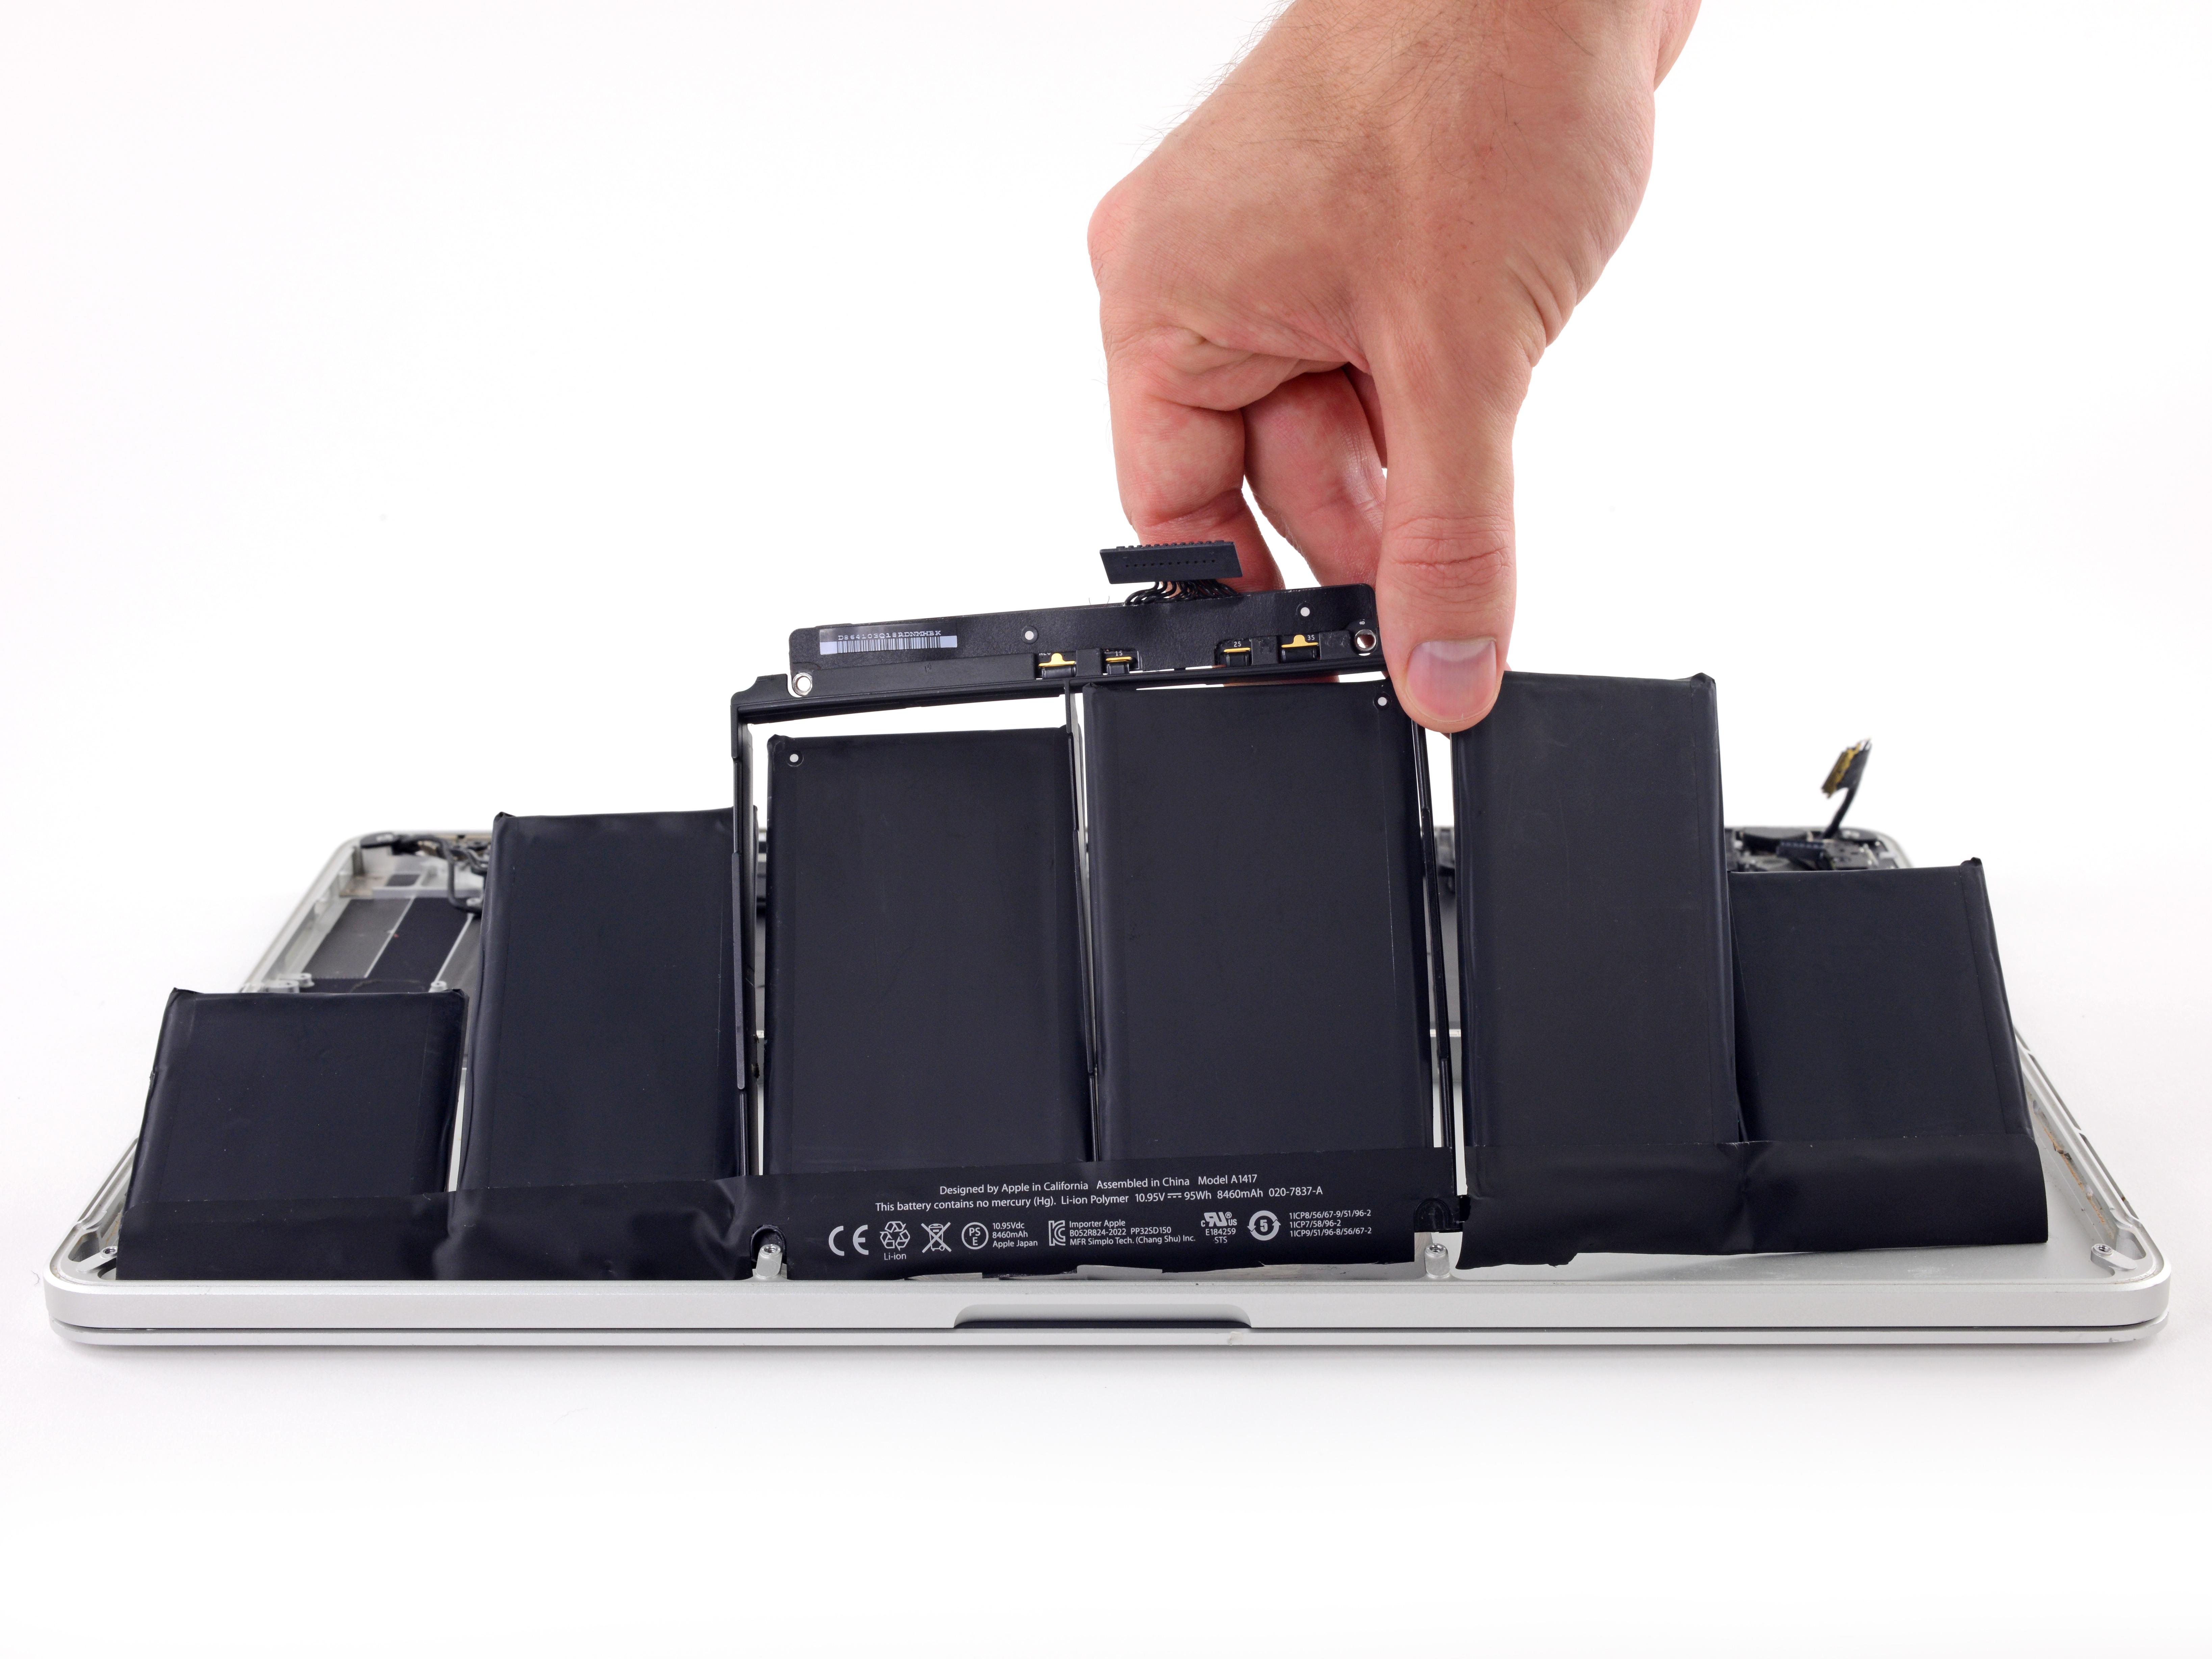 macbook pro 15 retina display mid 2012 battery. Black Bedroom Furniture Sets. Home Design Ideas